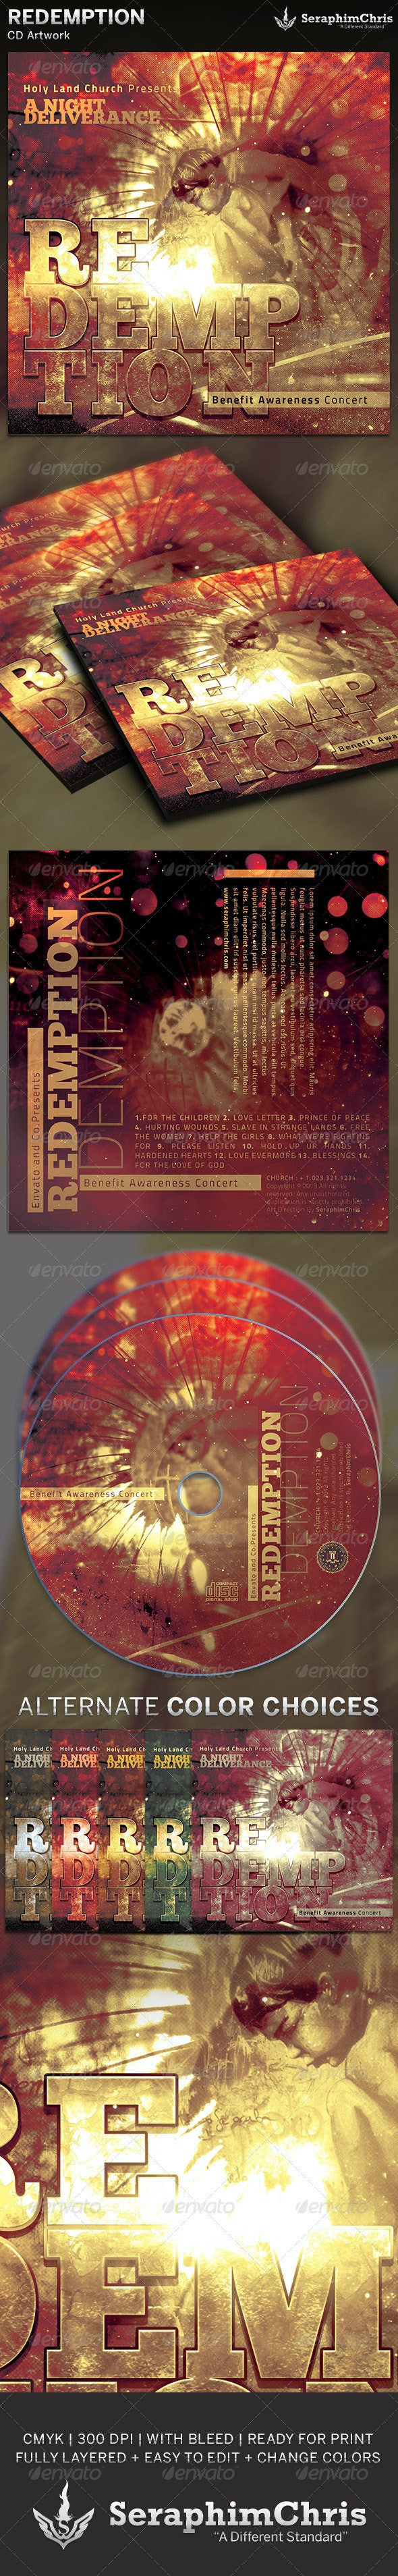 Redemption Benefit Concert: CD Artwork Template - CD & DVD Artwork Print Templates